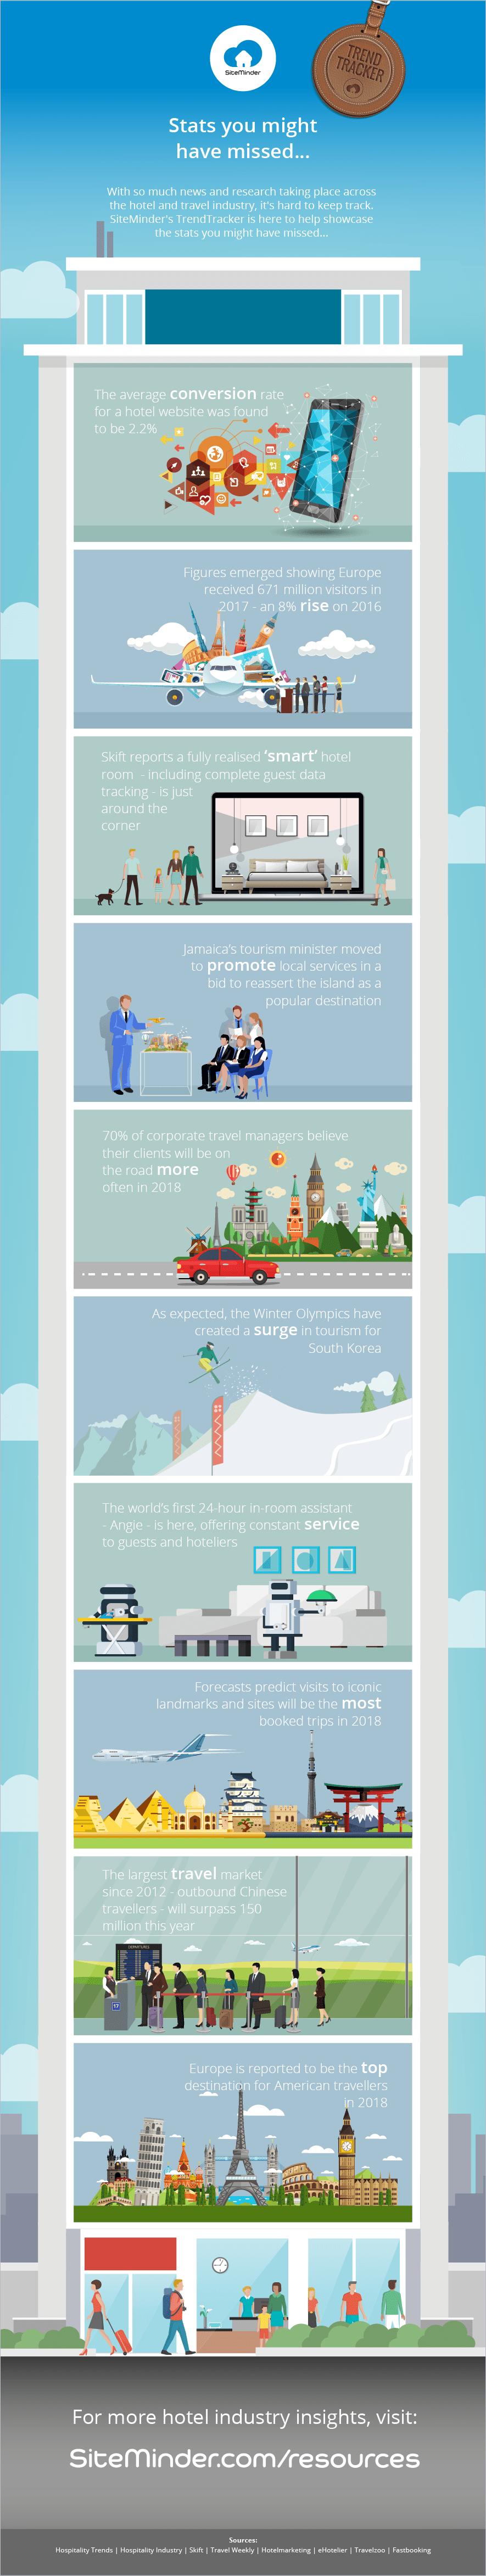 February travel stats